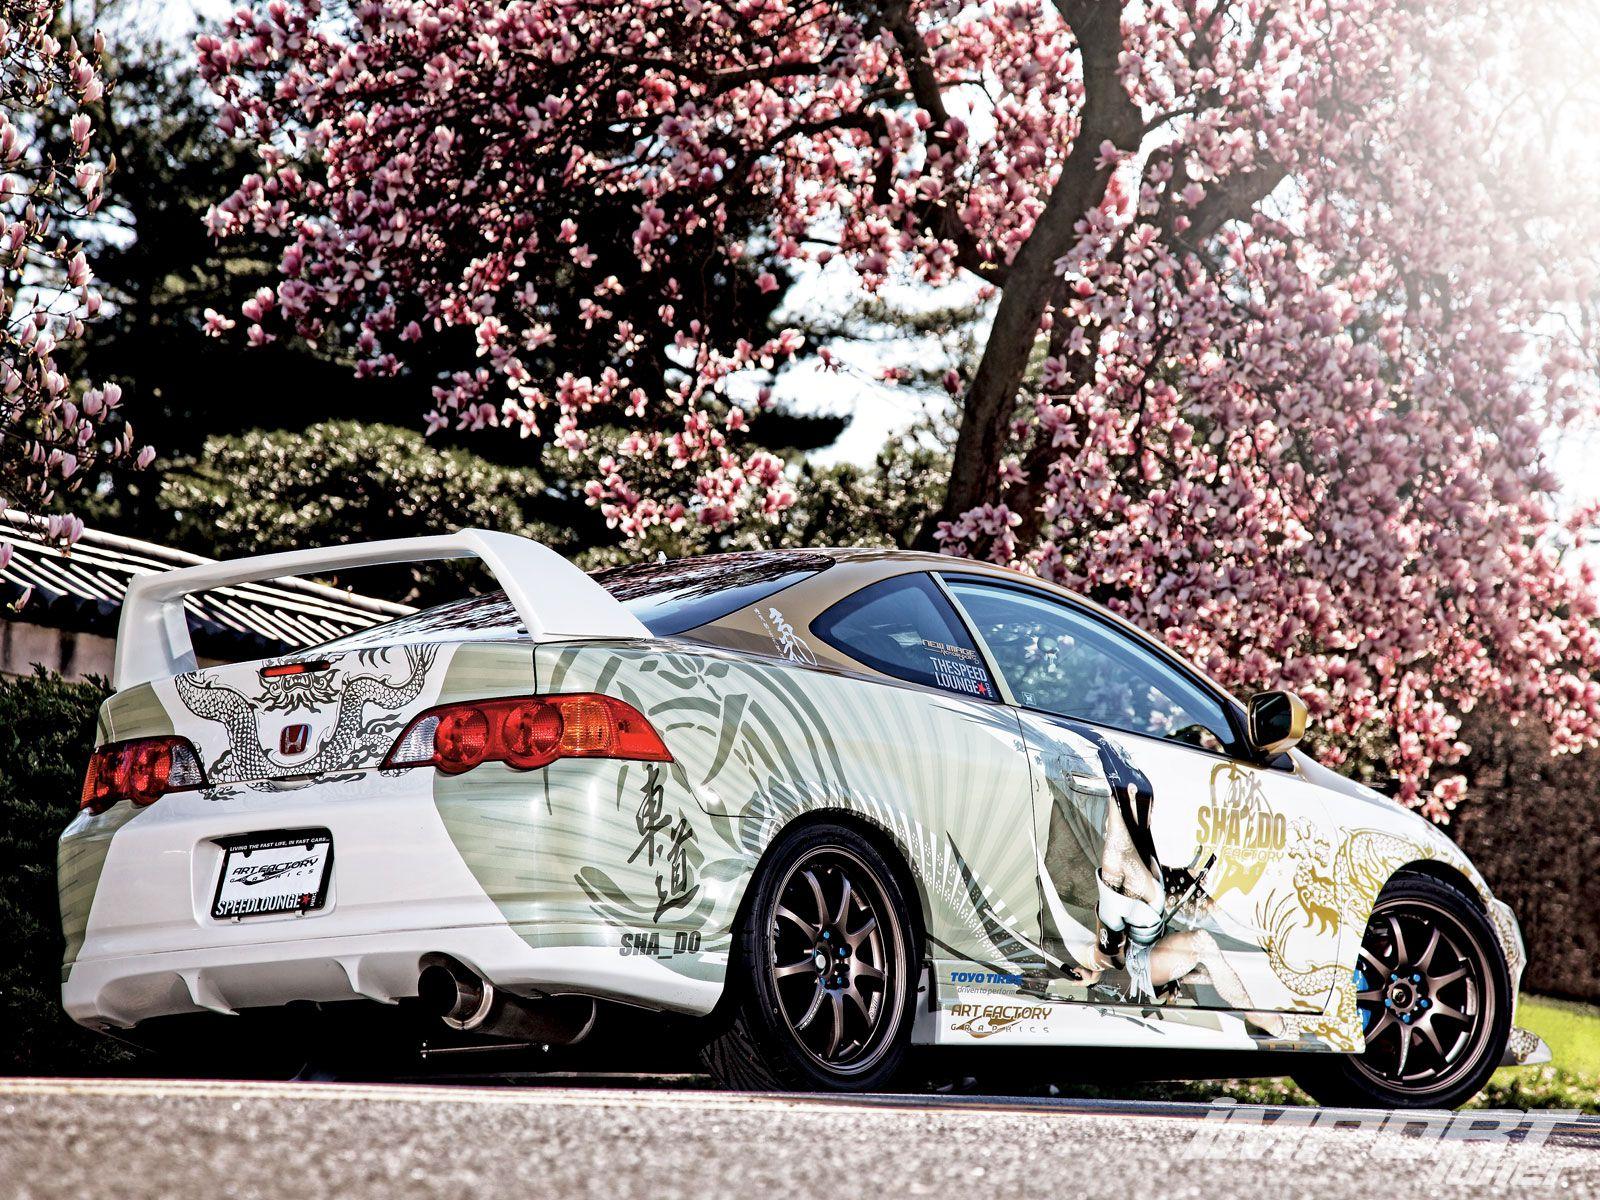 Honda City Car Hd Wallpaper Download Acura Rsx Type S For Sale Hd Desktop Wallpapers 4k Hd